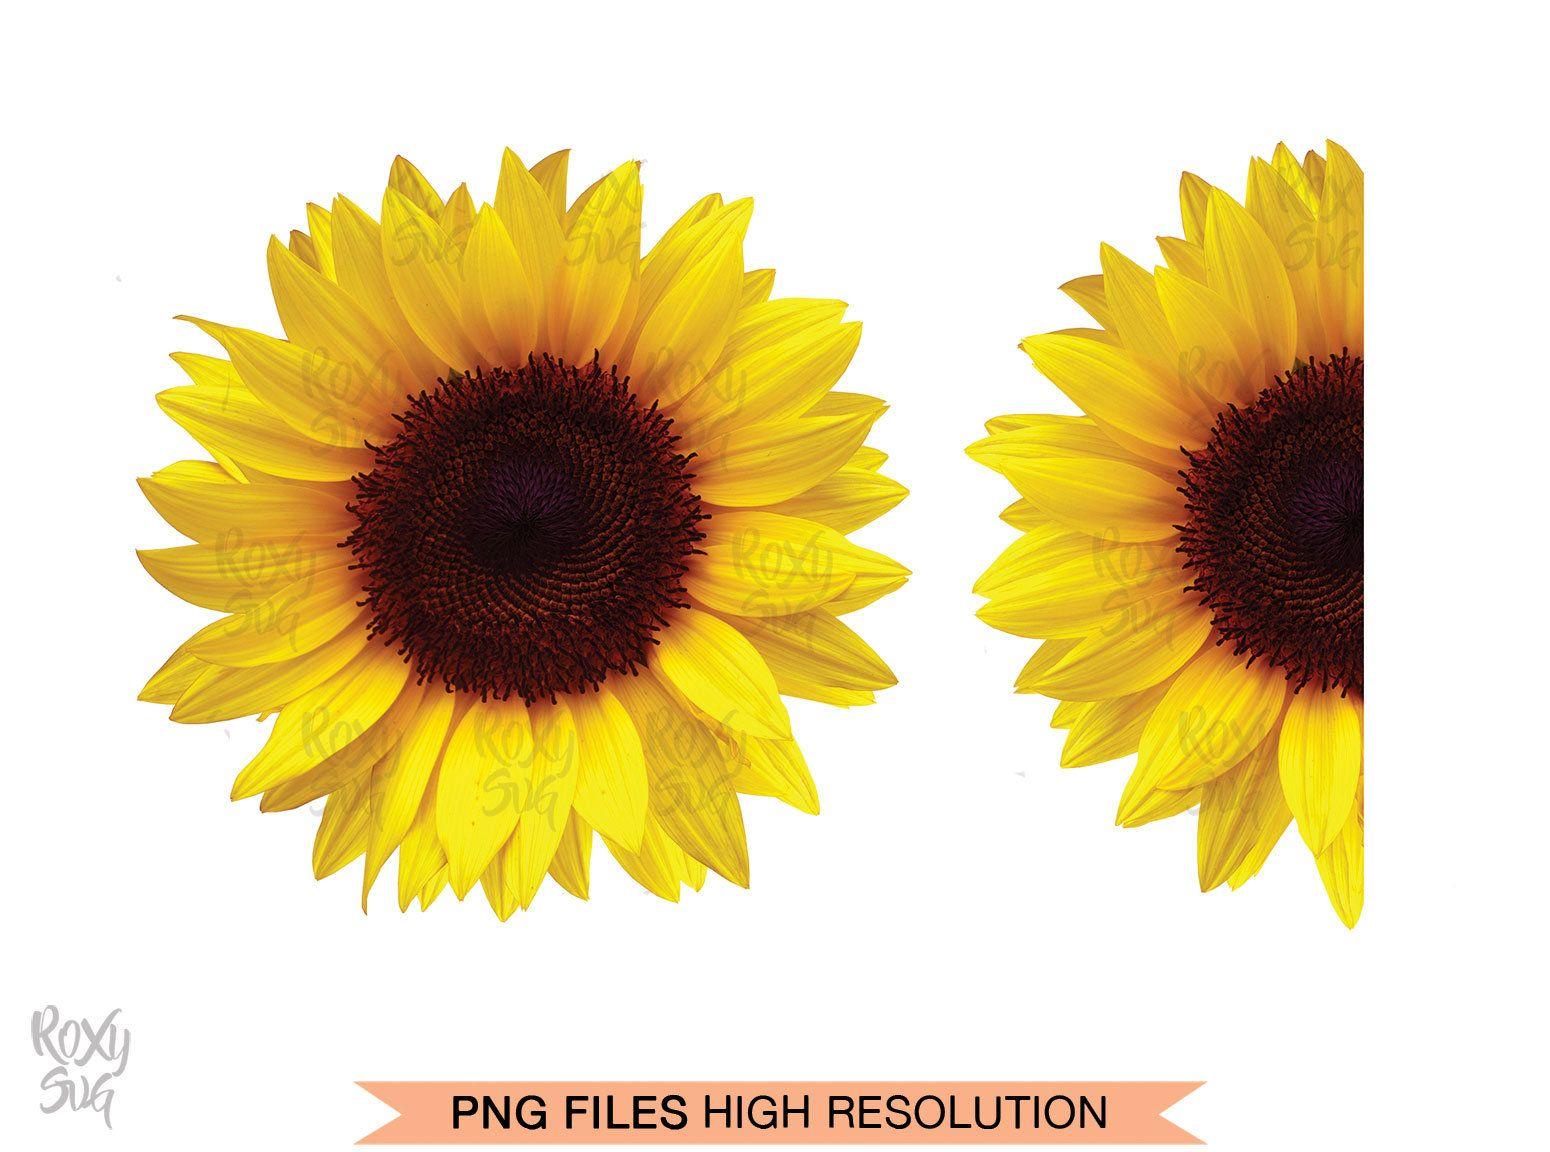 Half sunflower whole sunflower sunflower clipart sunflower